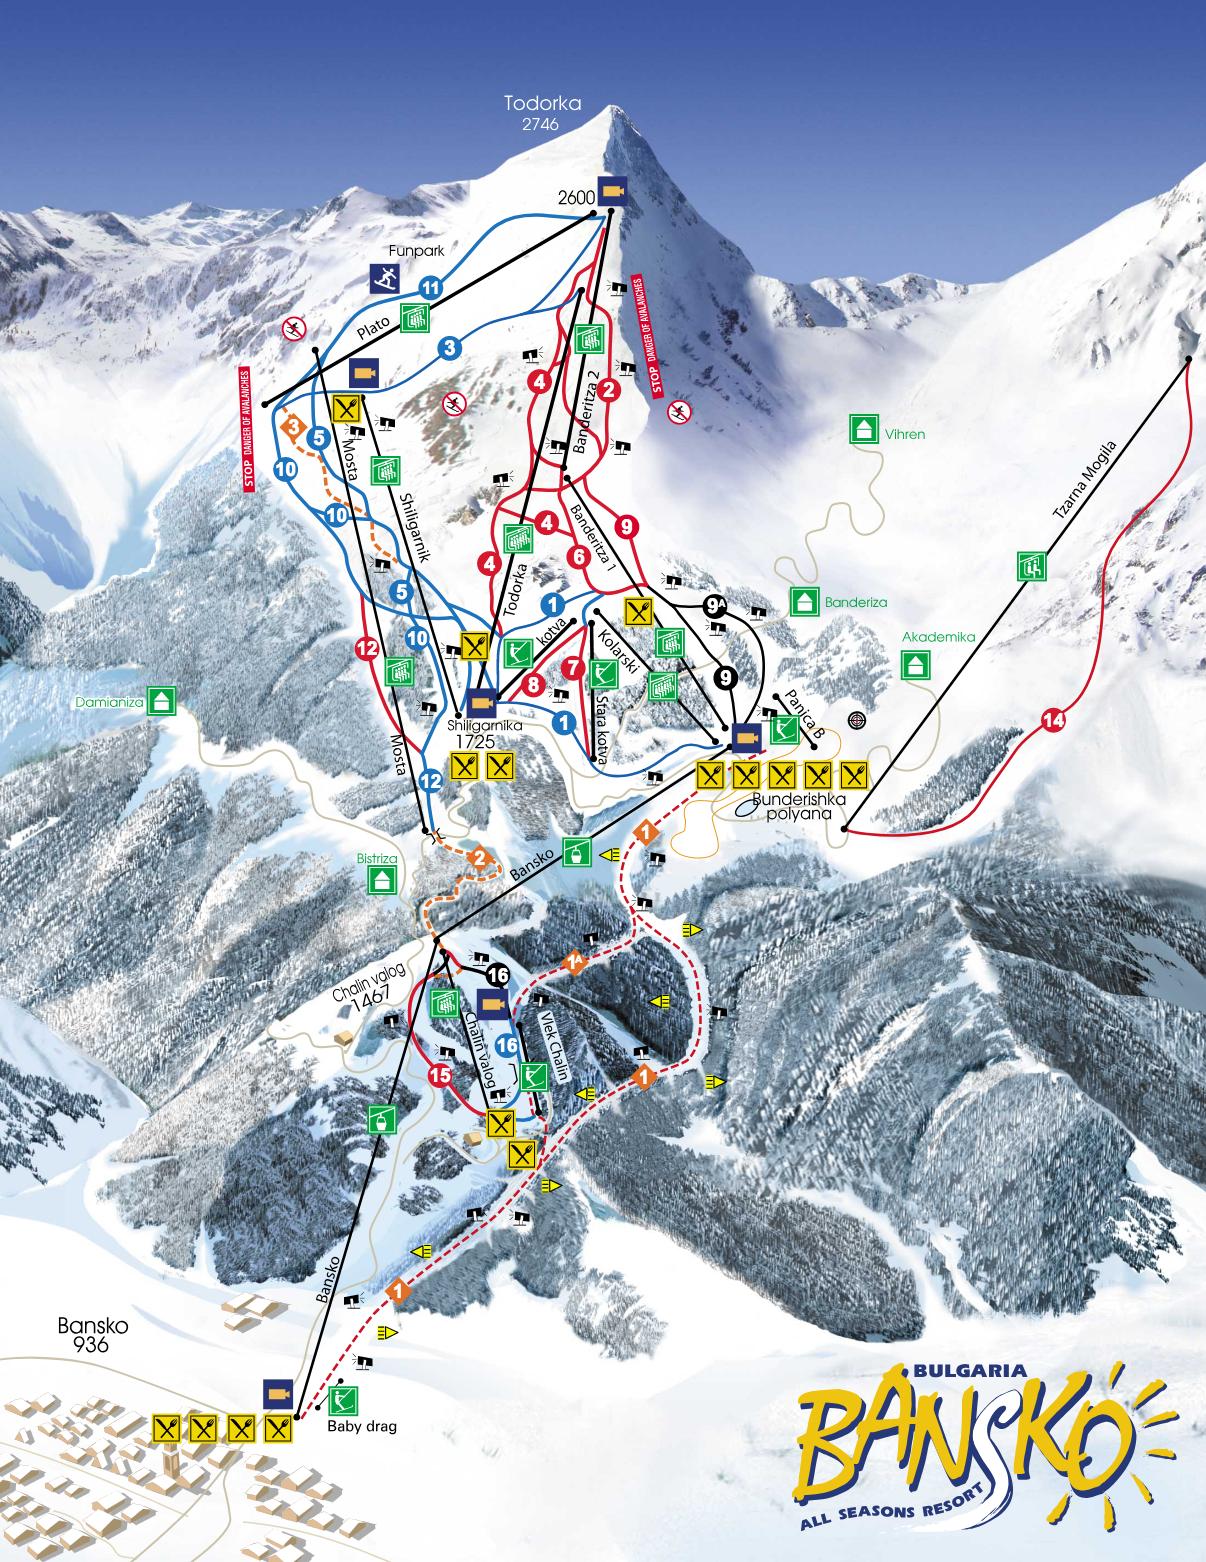 Bansko Ski Slopes Detailed Map